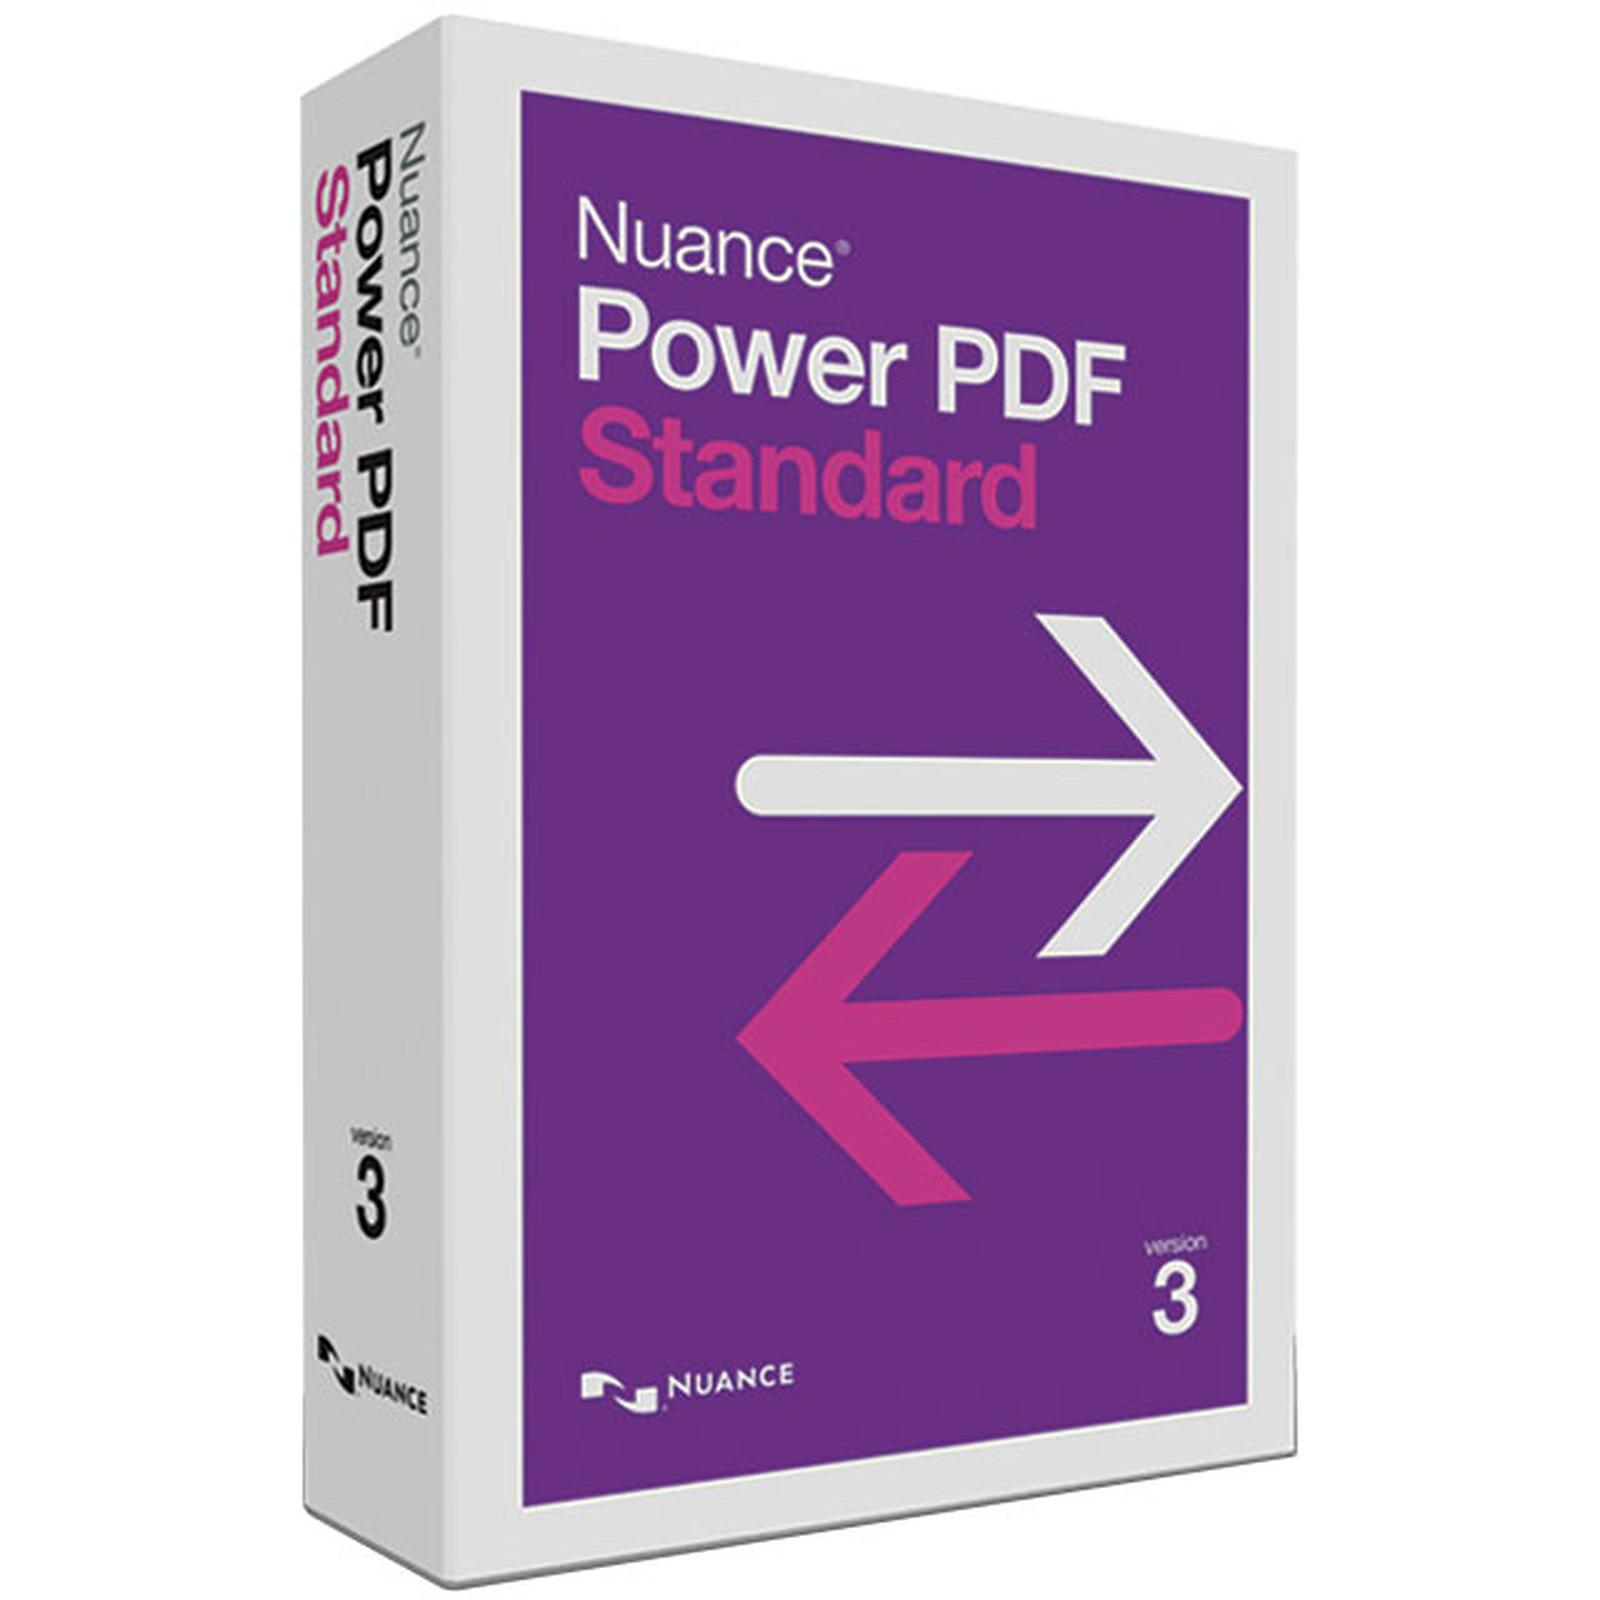 Nuance Power PDF Standard version 3